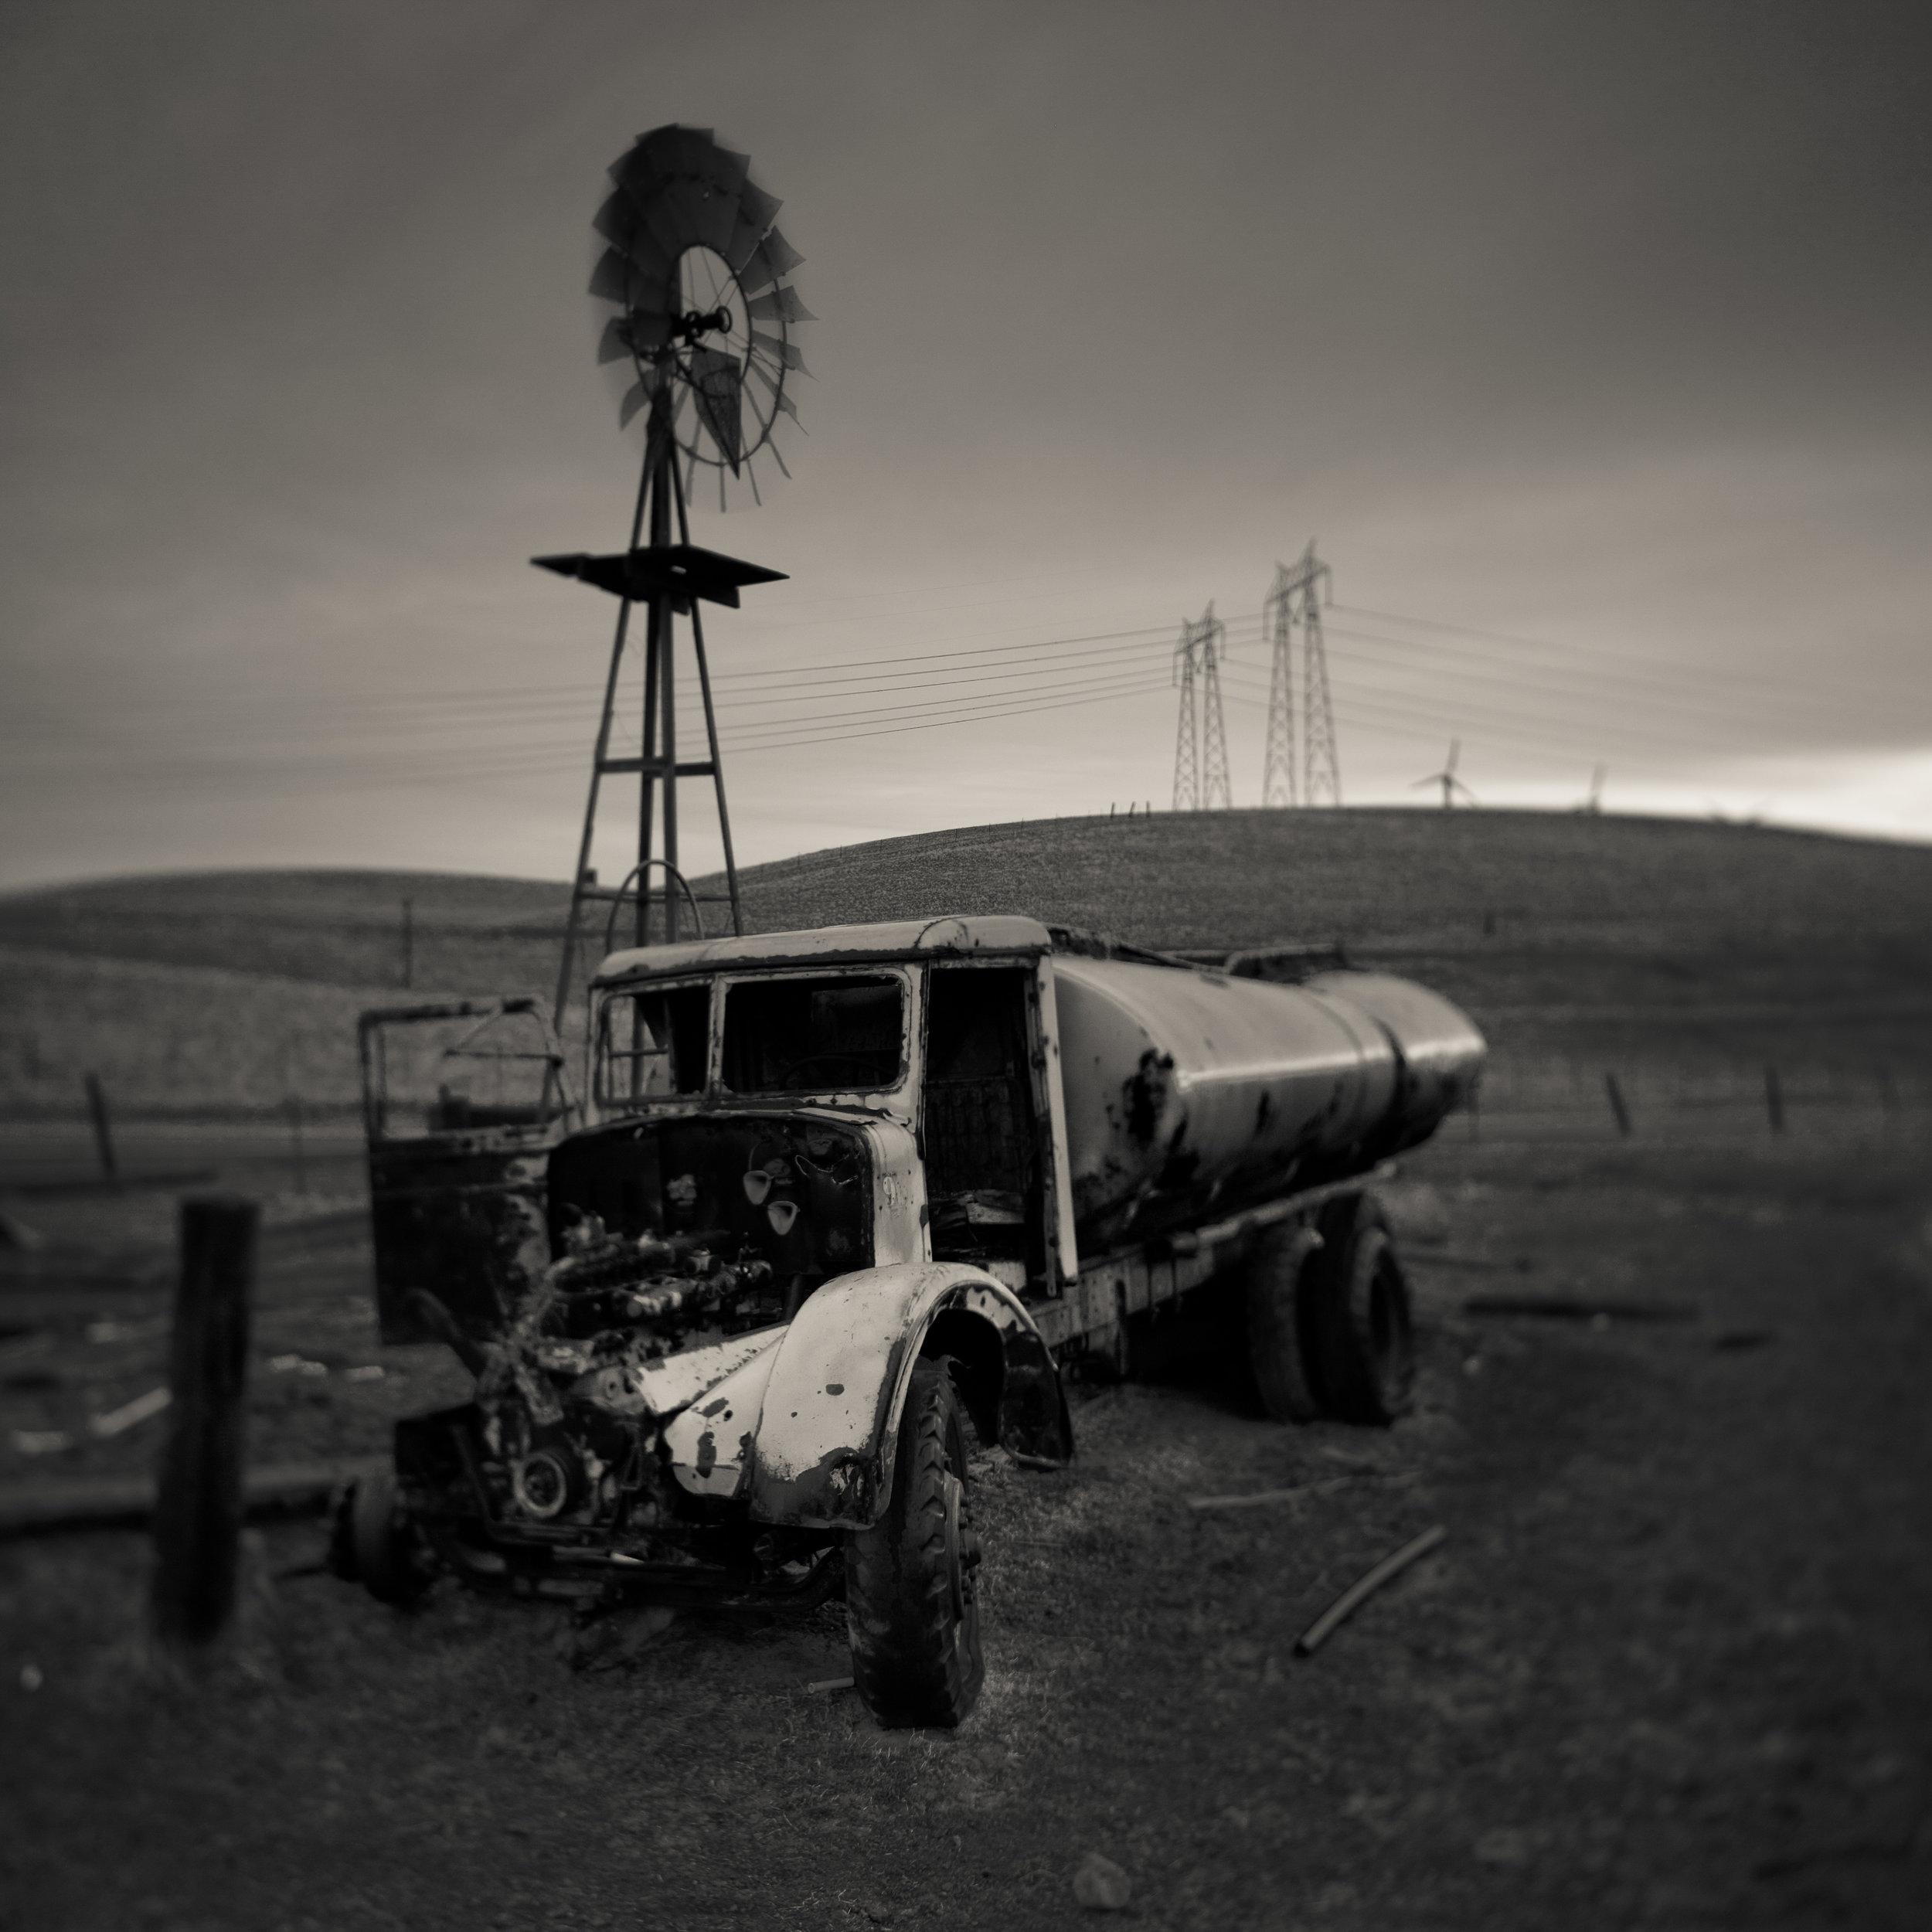 Altamont black white windmill truck abandoned rural